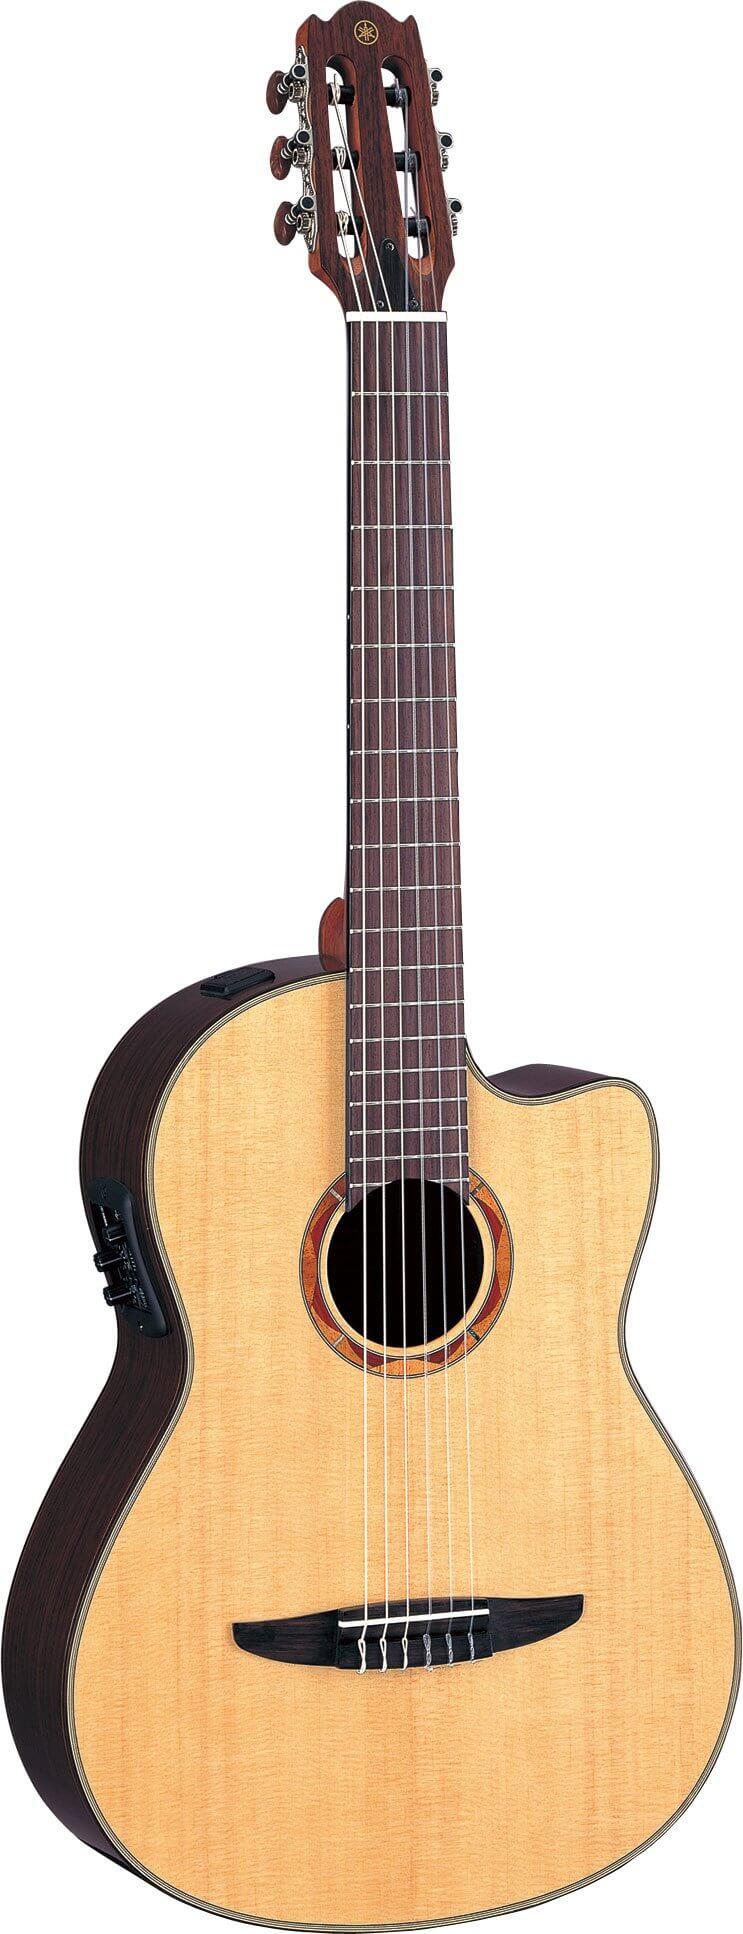 Guitarra Electroacústica Yamaha Ncx900R